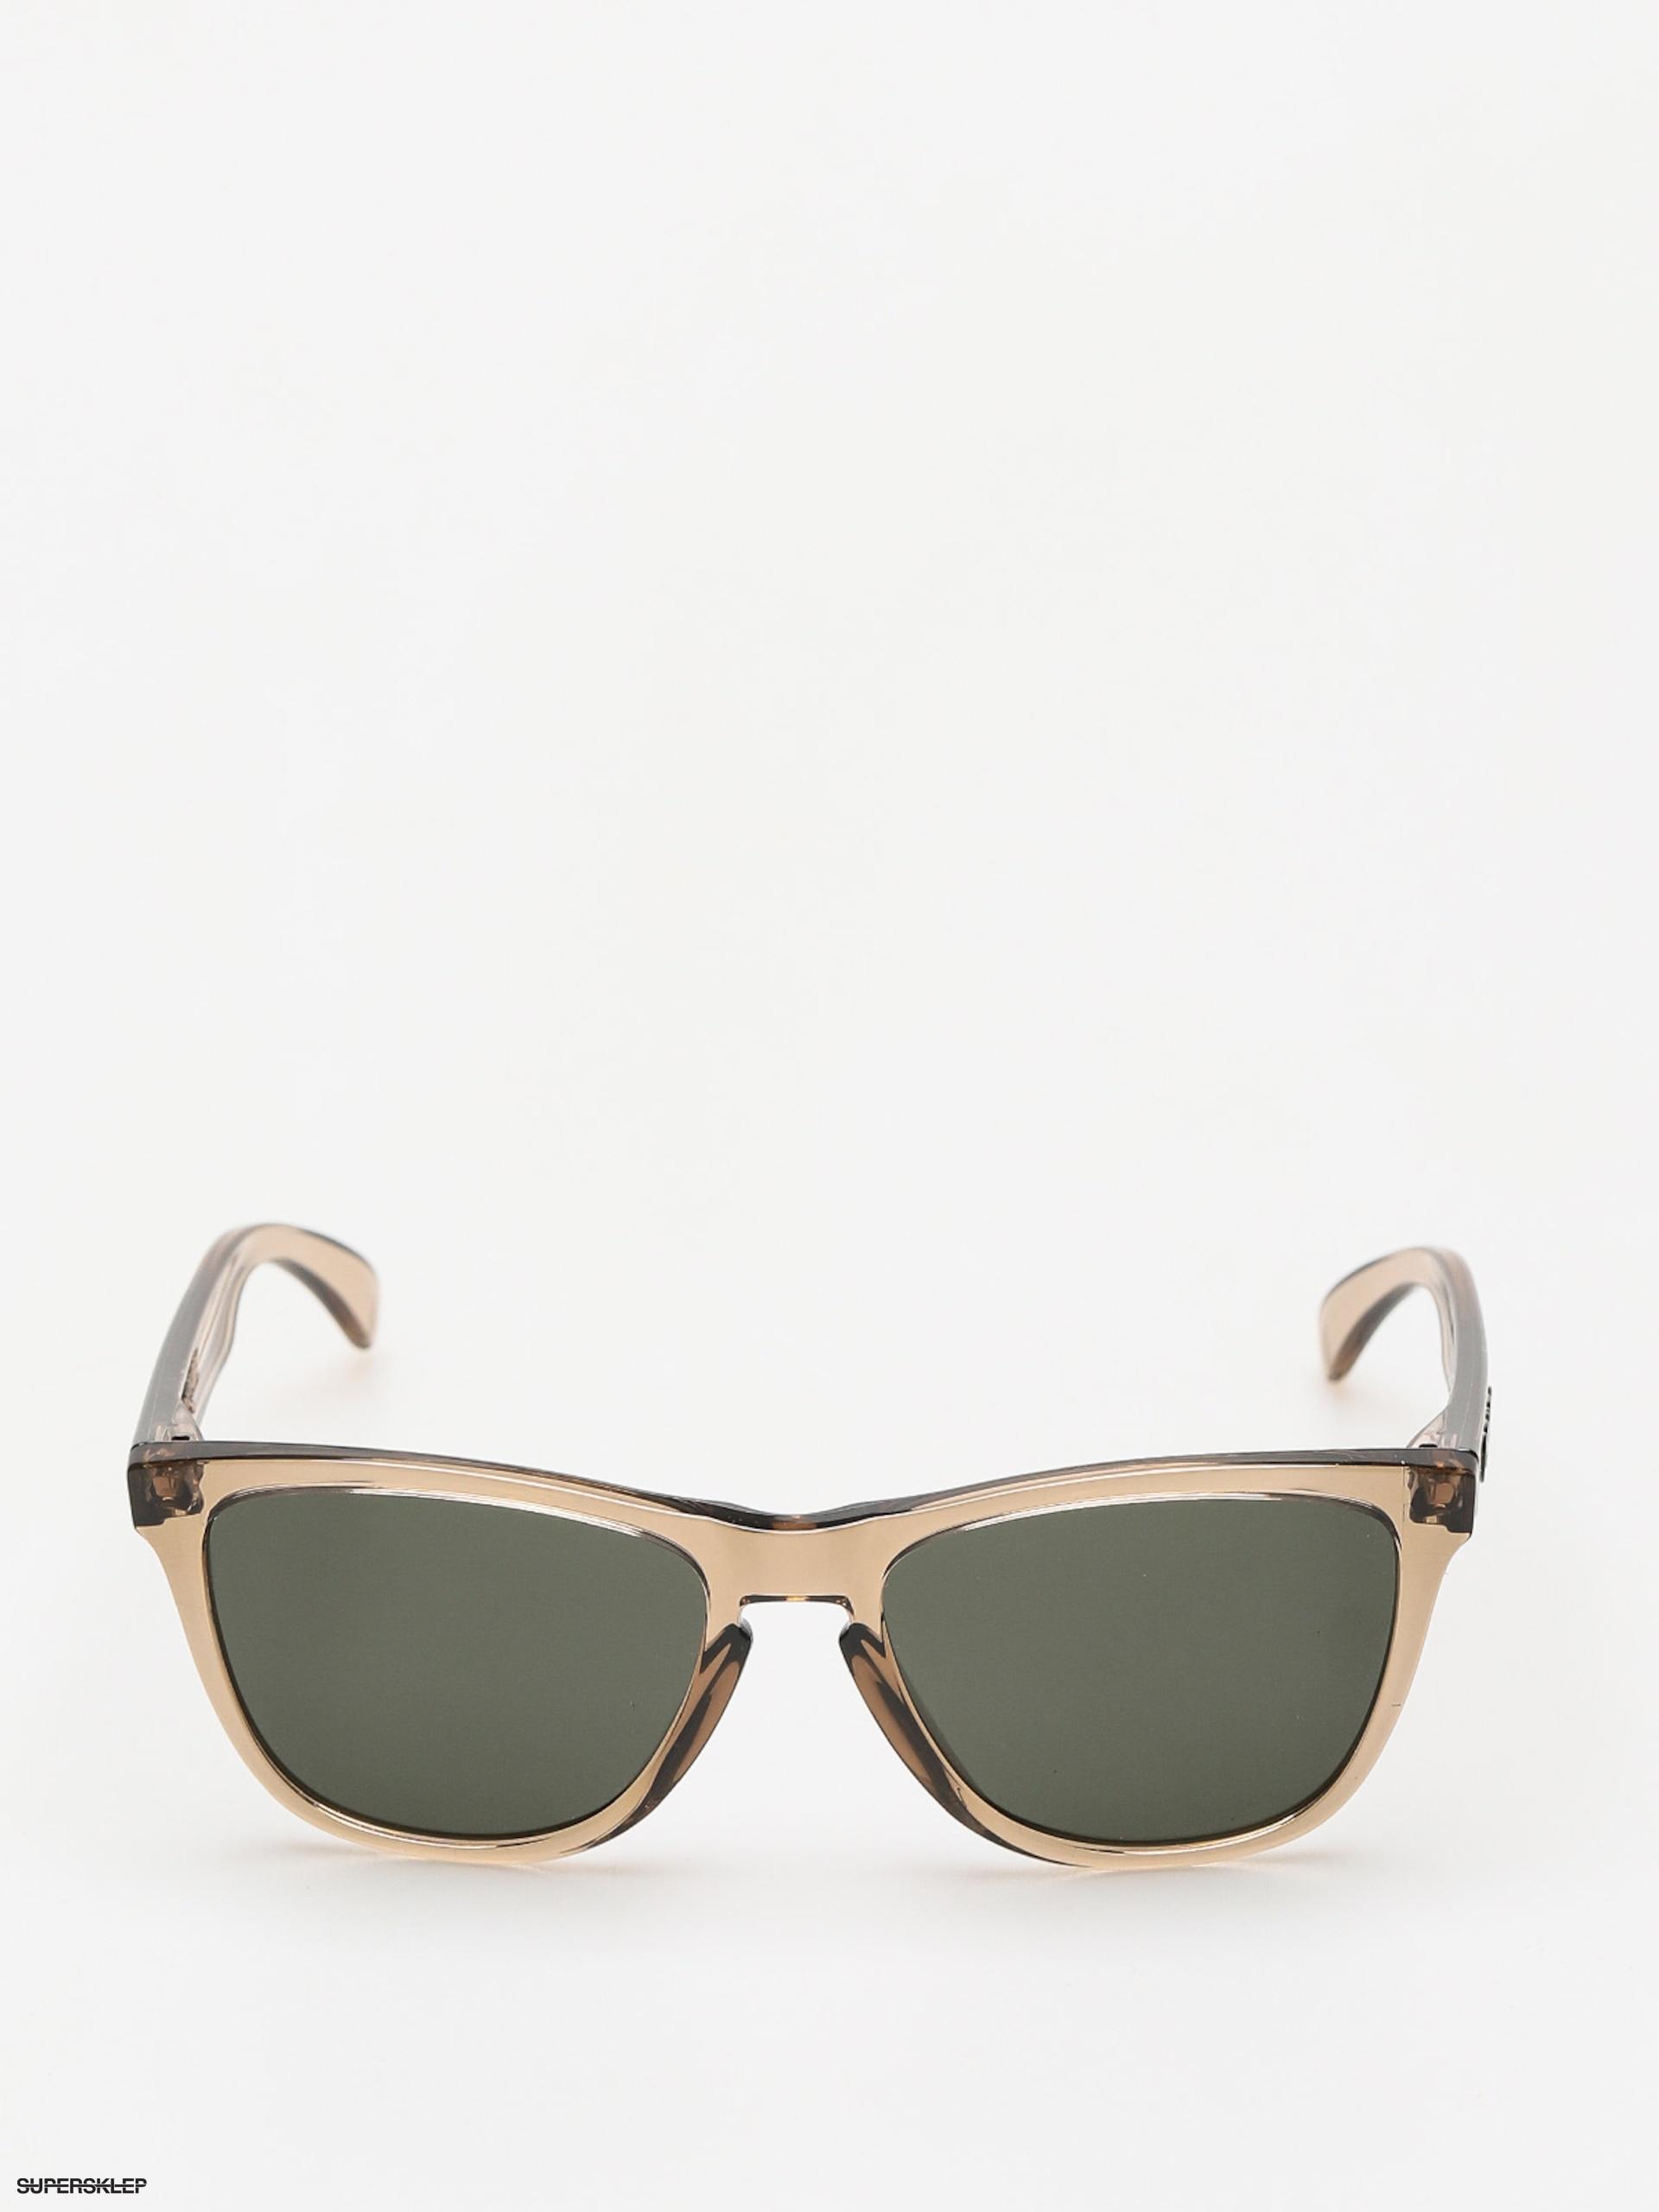 405bd1027 Slnečné okuliare Oakley Frogskins (sepia/dark grey)